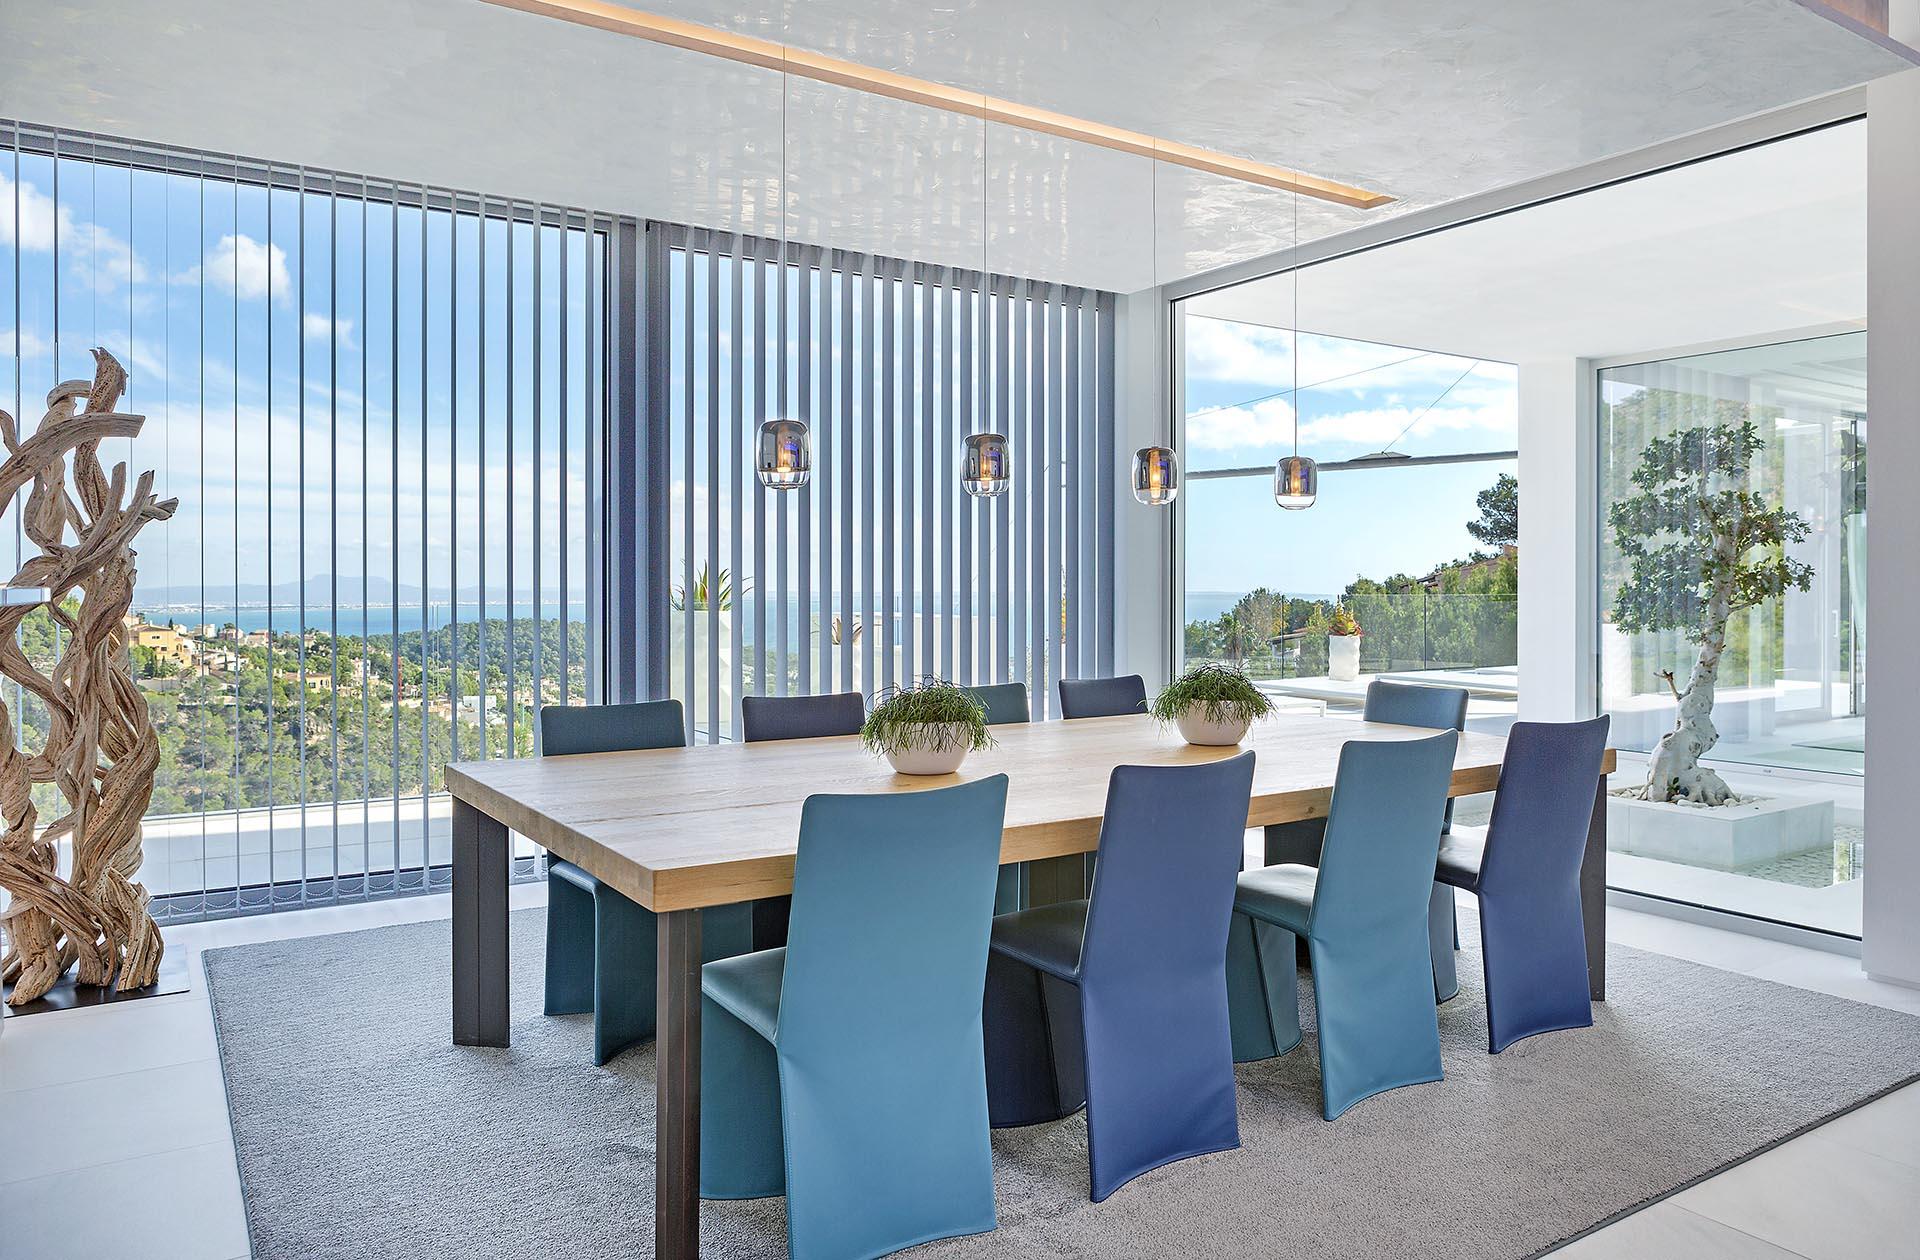 Beautiful modern villa in Costa den Blanes - Spacious dining room